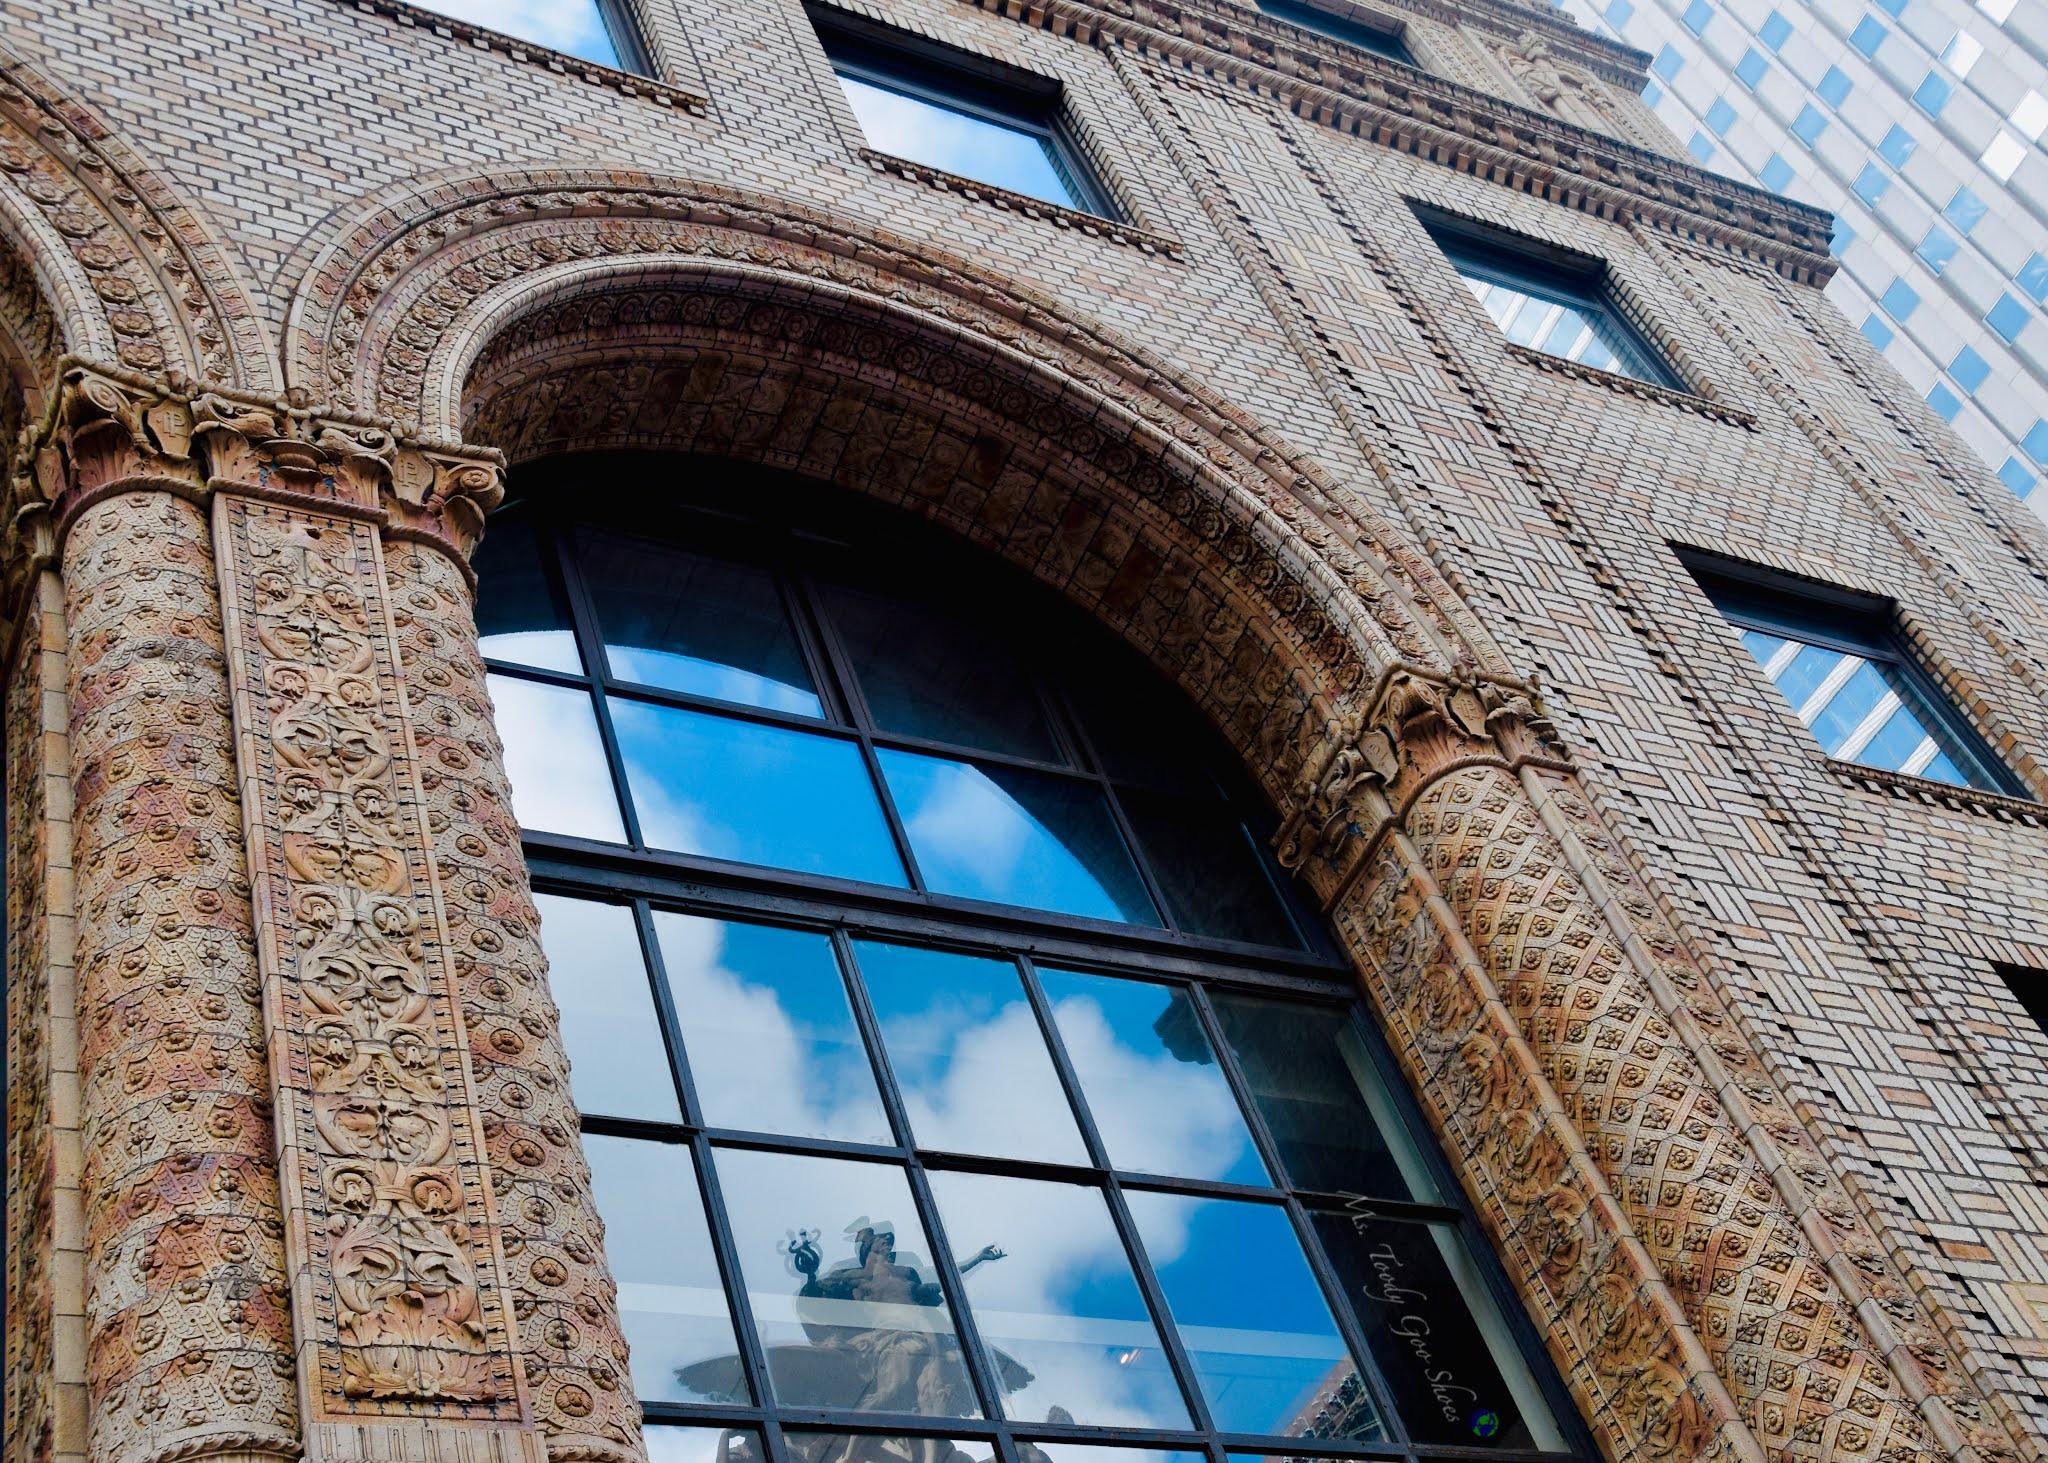 Bowery Savings Bank Building, NYC | Ms. Toody Goo Shoes